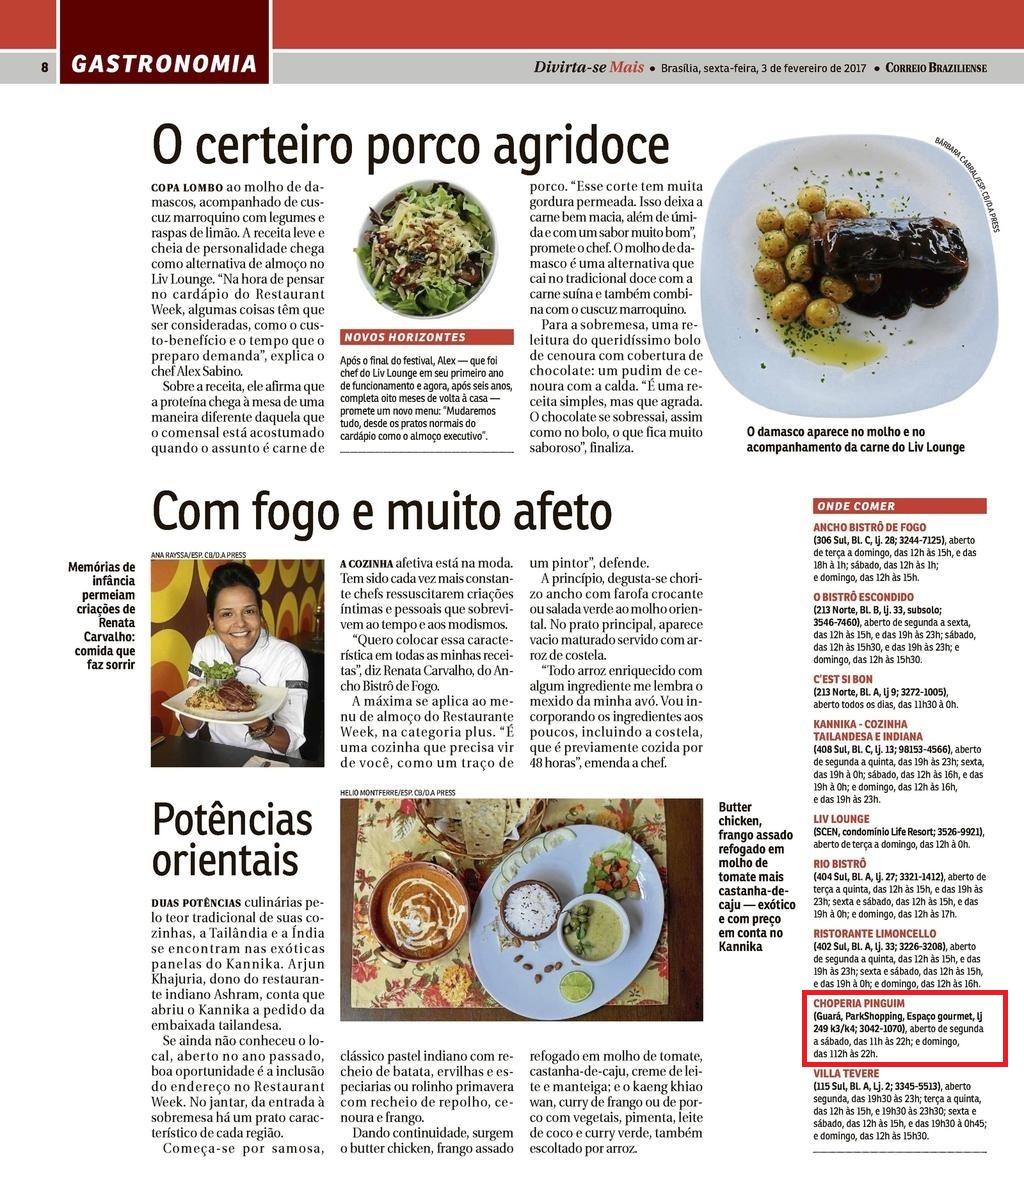 Divirta-se Mais - Correio Braziliense 03fev2017 05